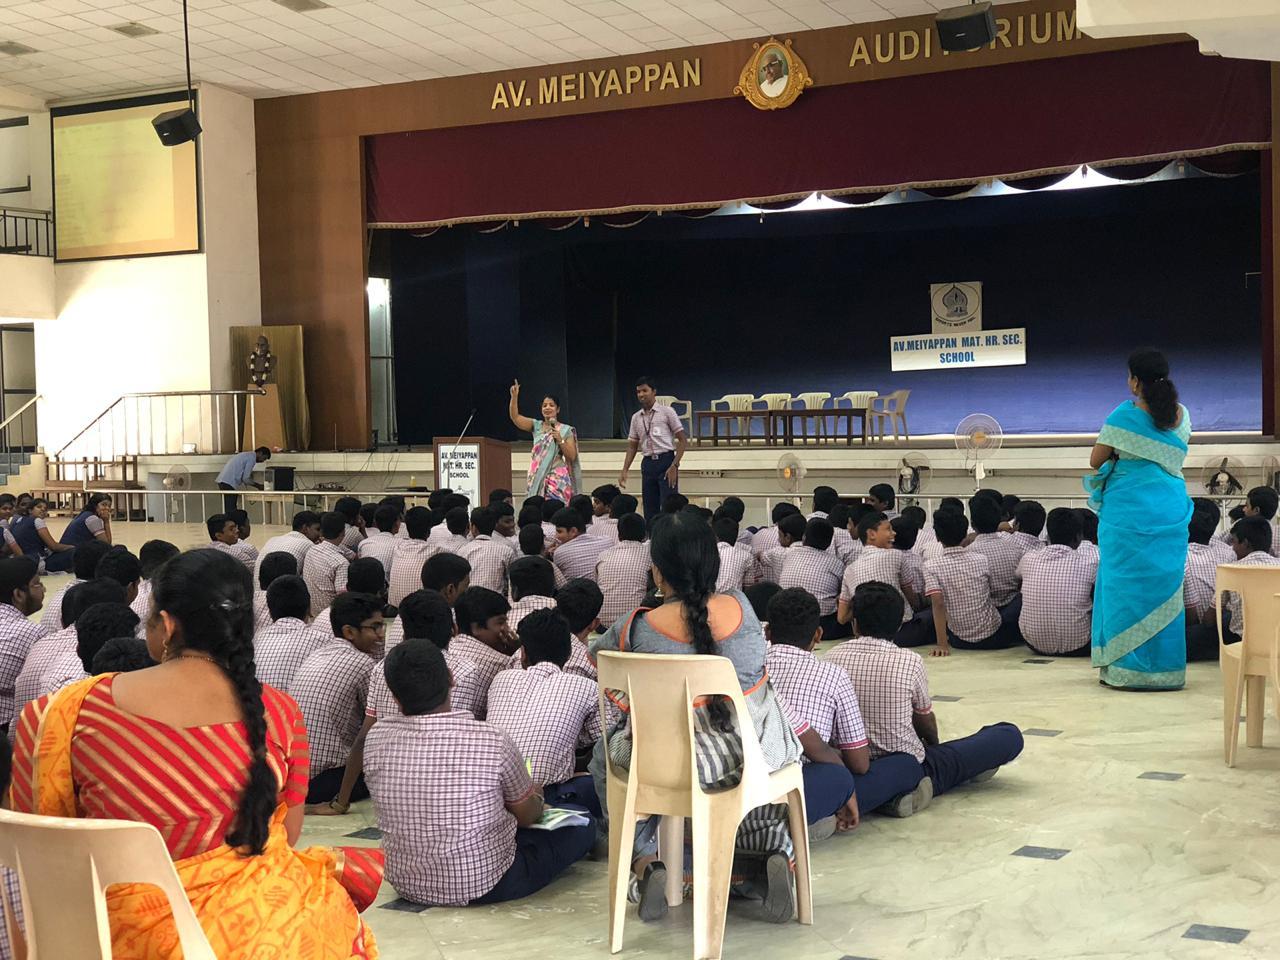 A.V. Meyappan Mat school-25th Jan 2019